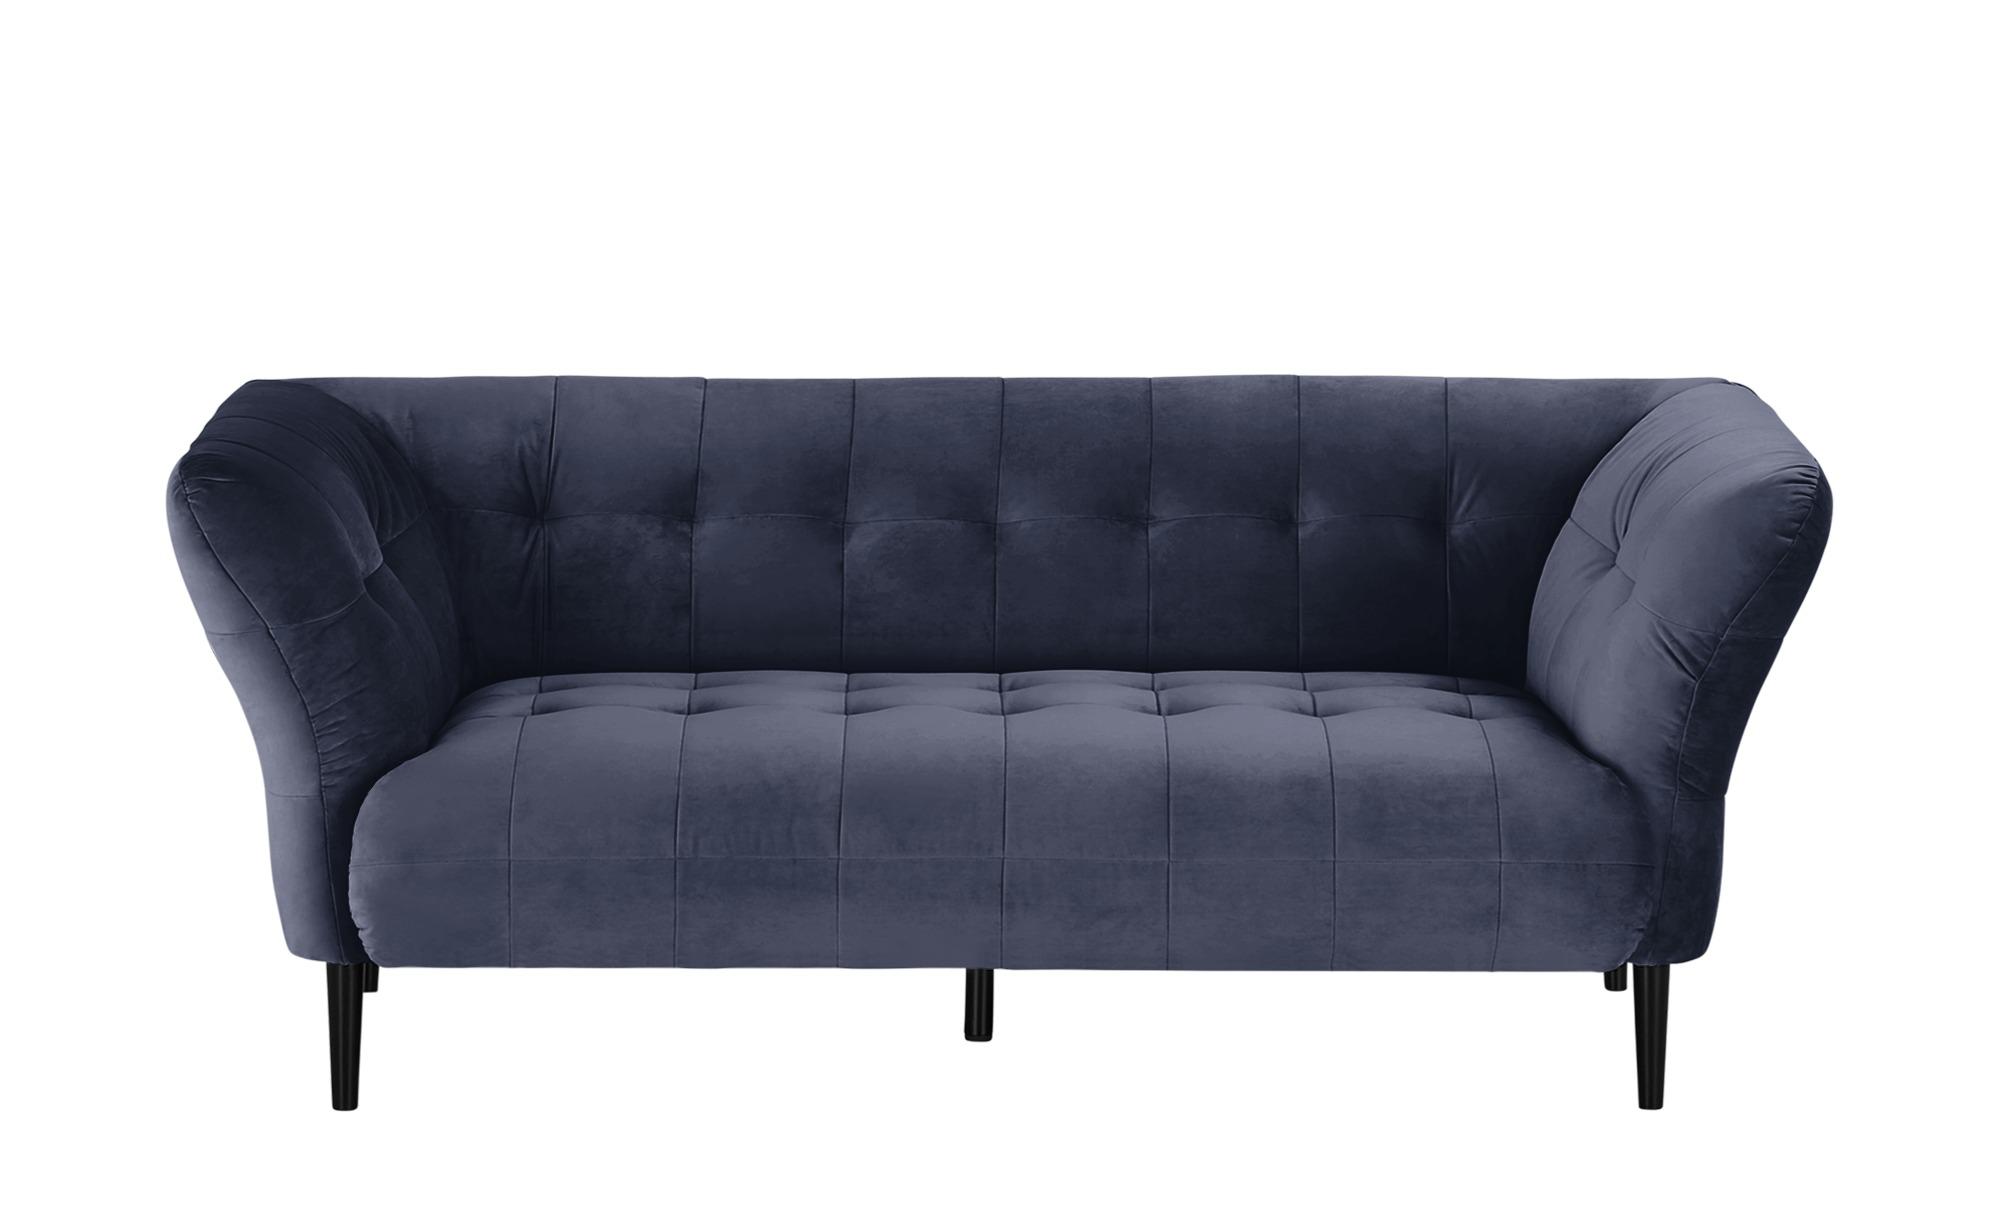 Sofa  Puccini ¦ blau ¦ Maße (cm): B: 200 H: 79 T: 97 Polstermöbel > Sofas > 2-Sitzer - Höffner